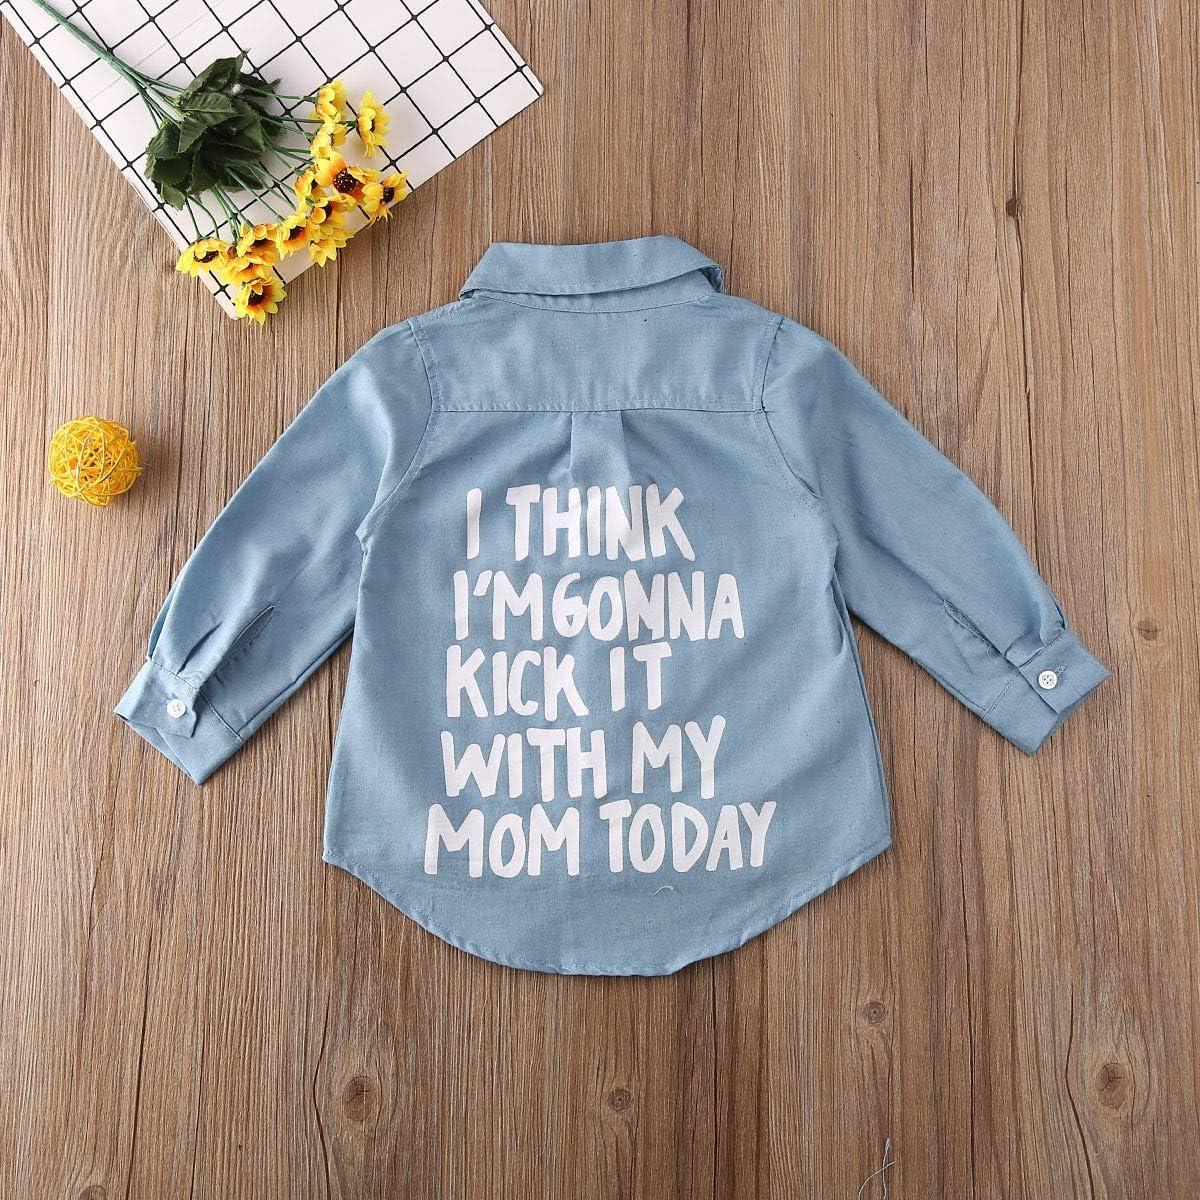 Kosusanill Kids Toddler Baby Boys Girls Denim Long Sleeve Button Up Shirt Spring Fall Causal Tops Blouse